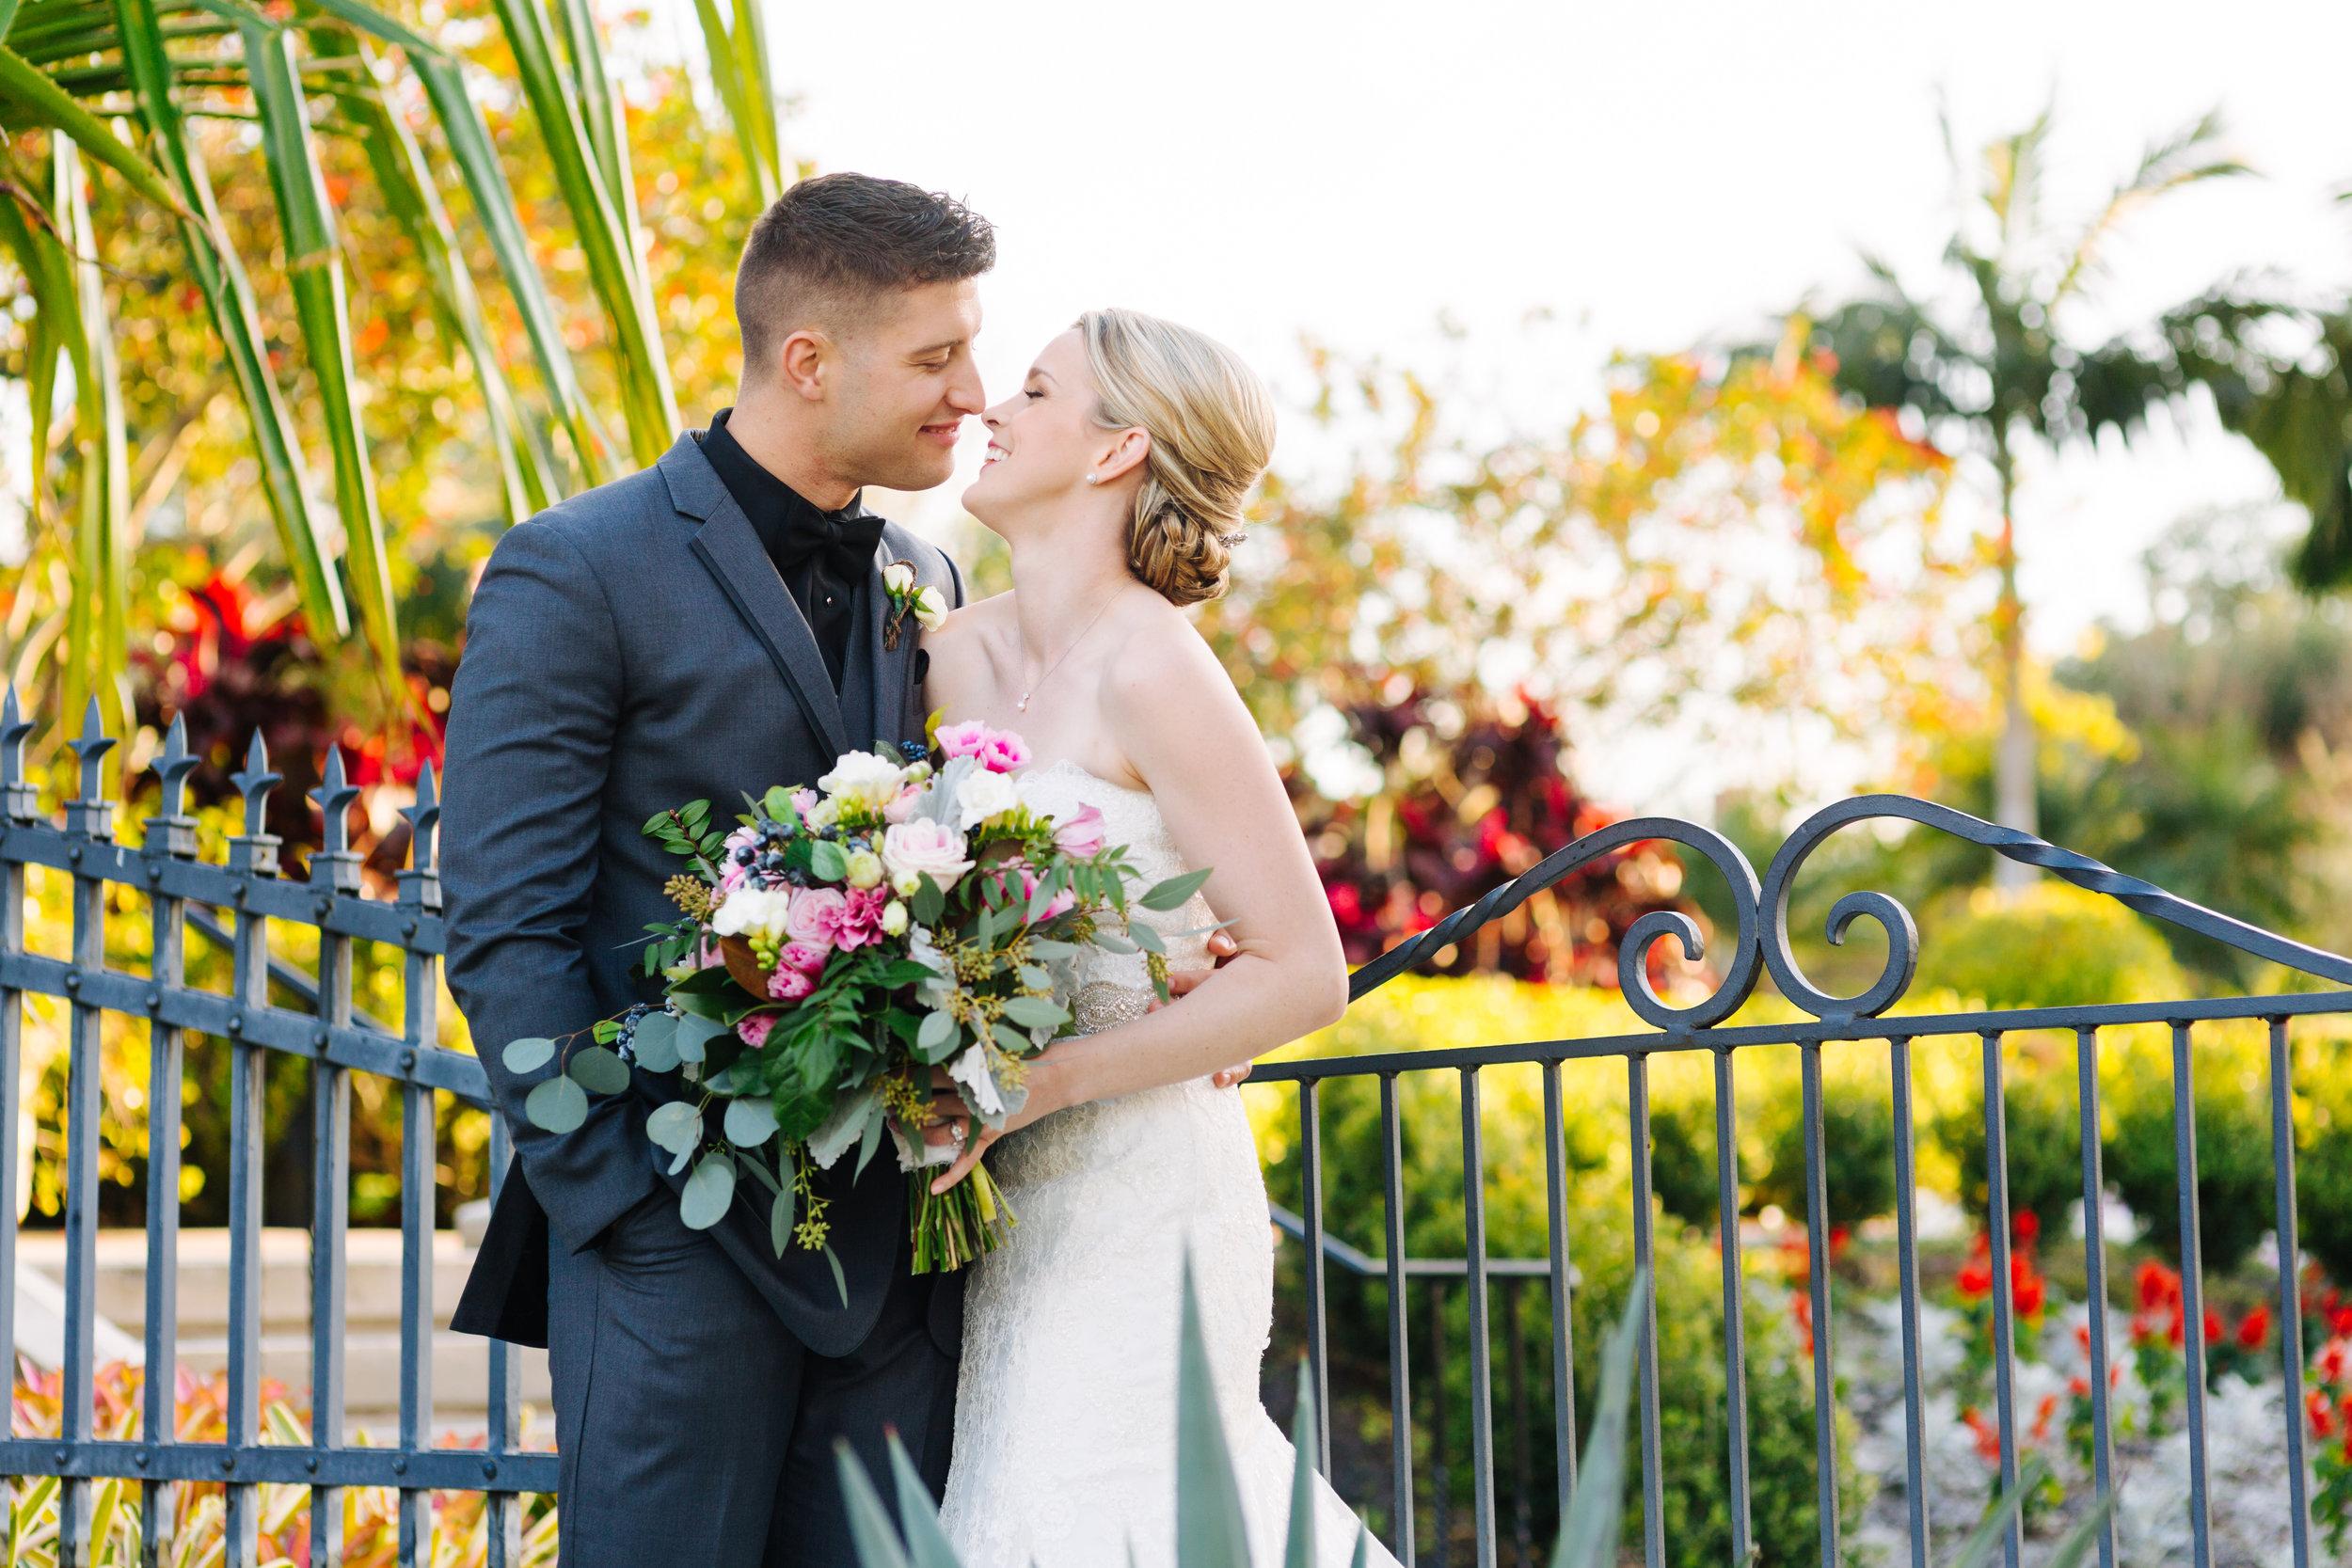 hollis gardens wedding downtown lakeland wedding jake and katie photography-33.jpg